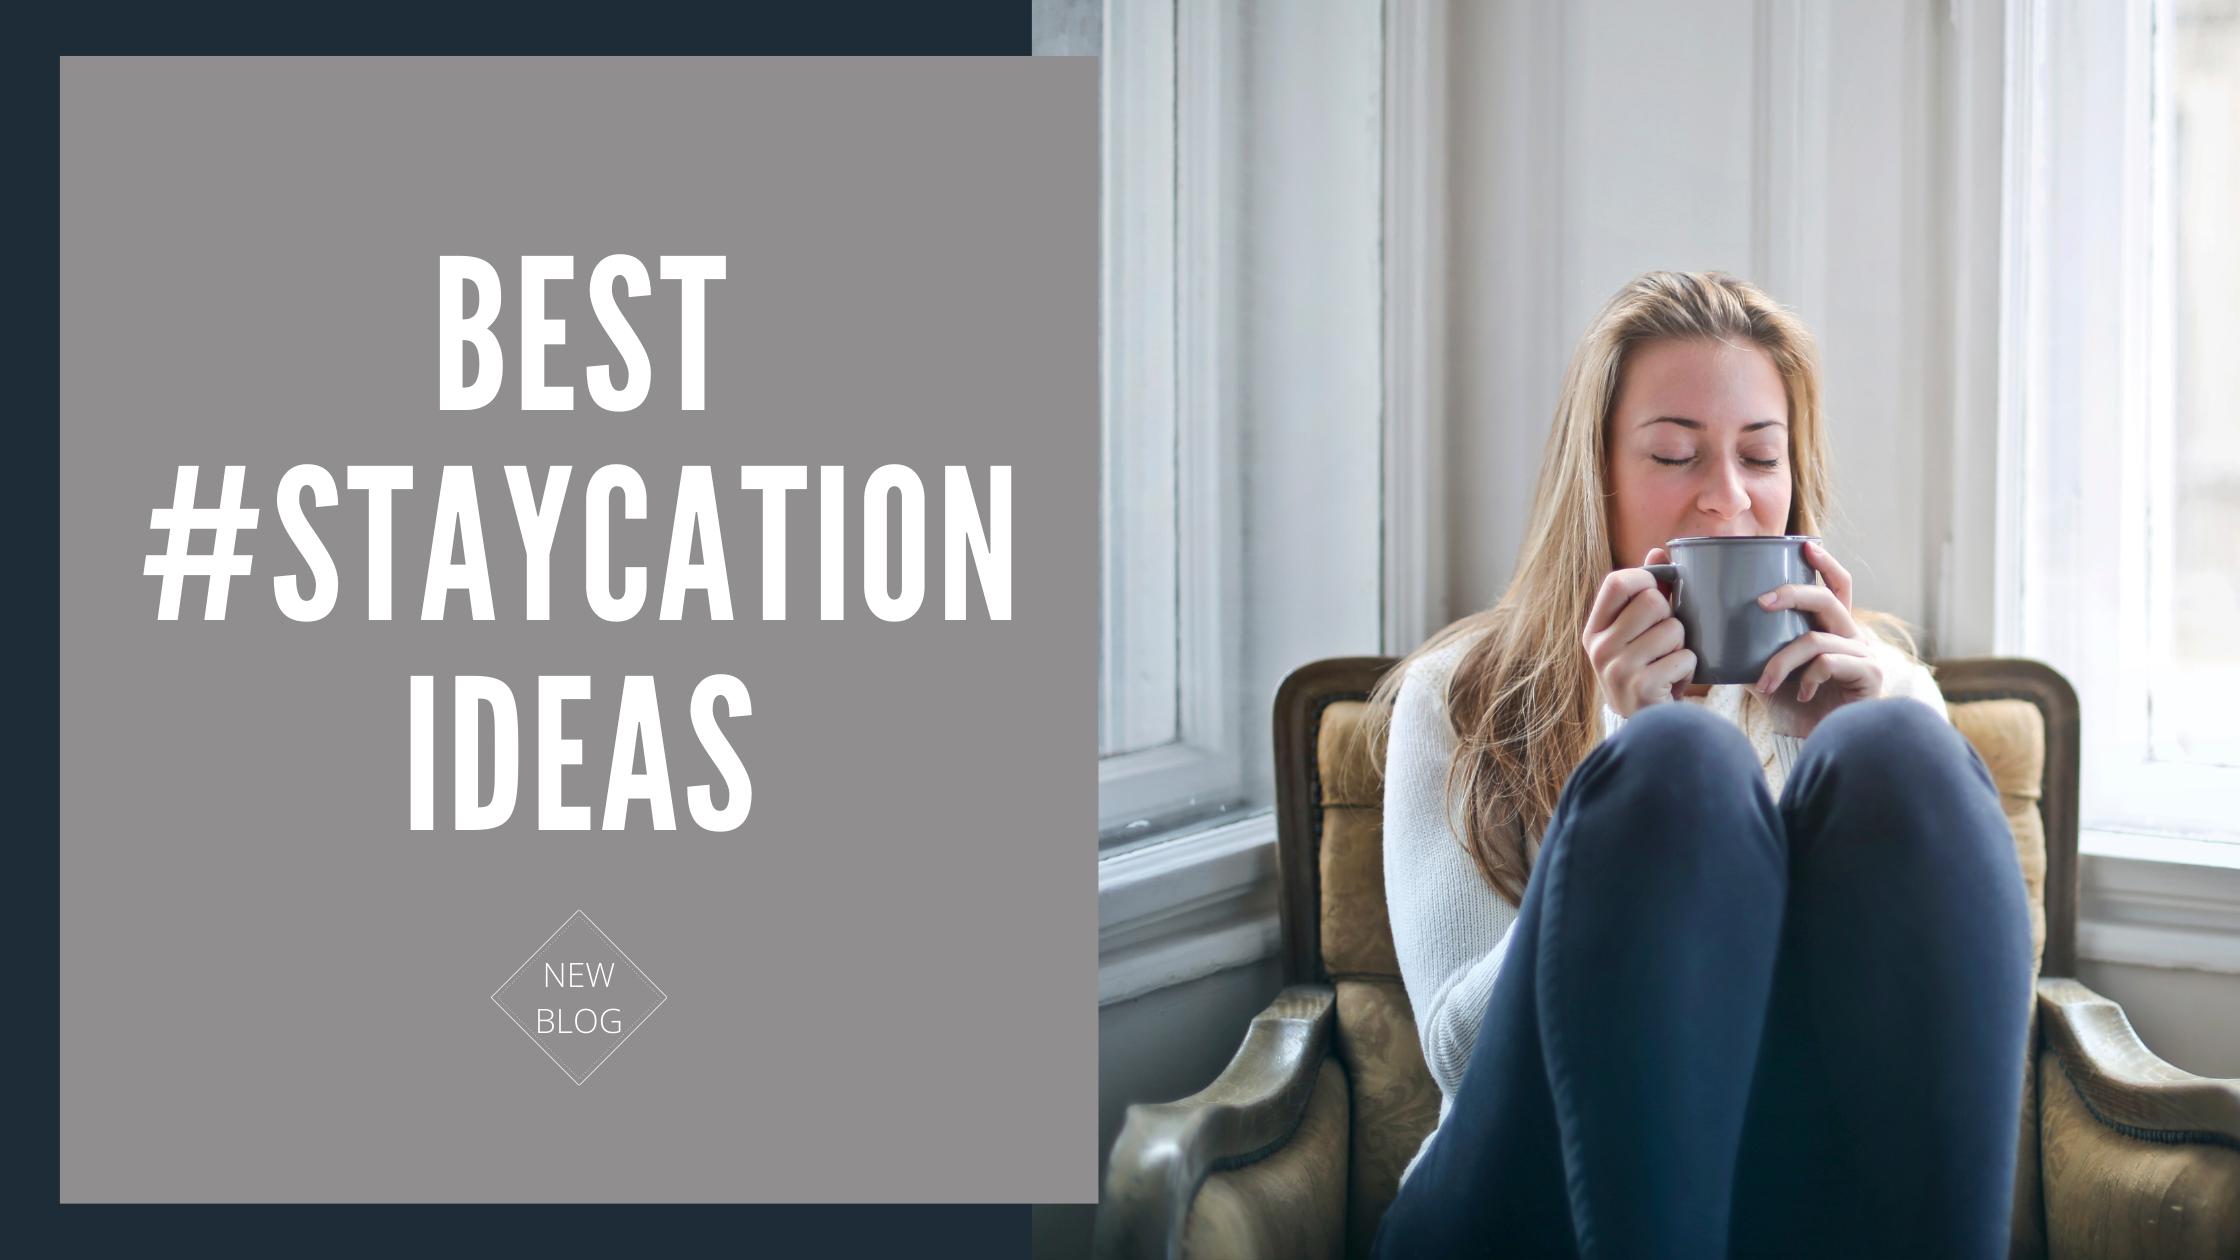 Staycation blog